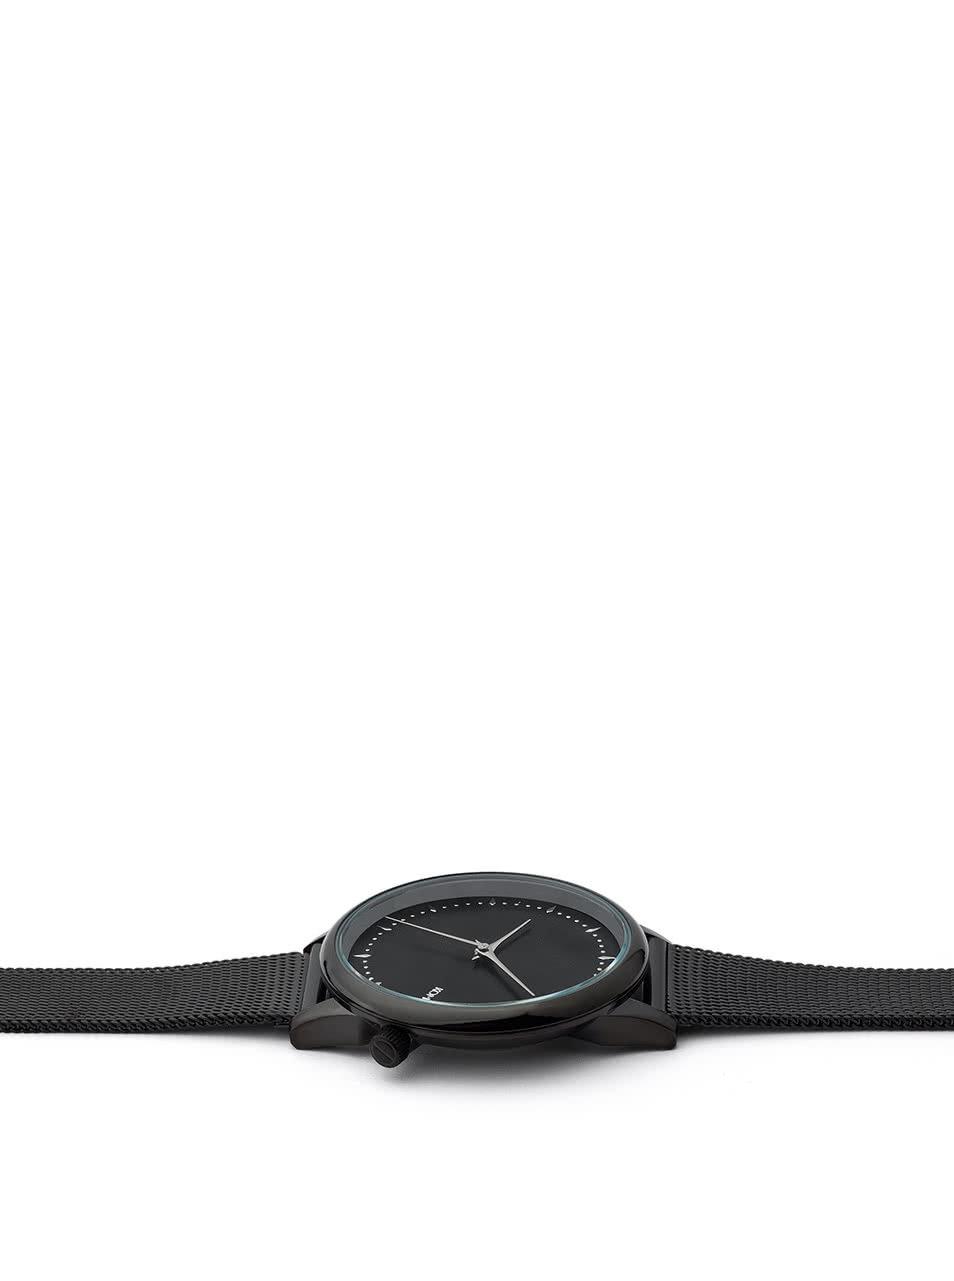 Dámske hodinky s čierným kovovým remienkom Komono Estelle Royale ... d82d9f0f240